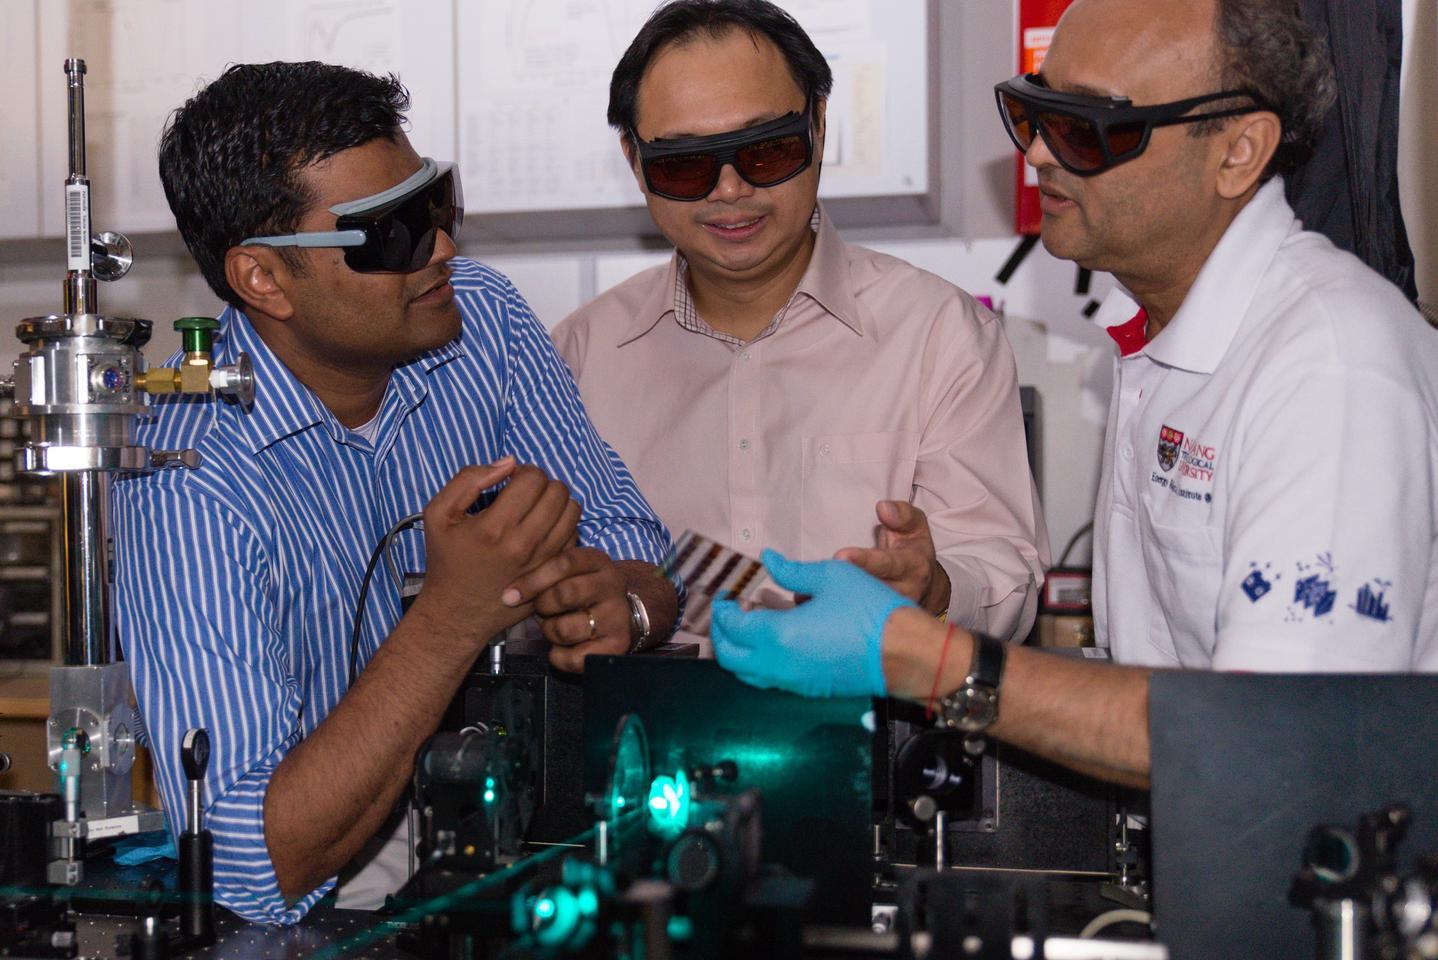 (L to R) Assistant Professor Nripan Mathews, Assistant Professor Sum Tze Chien and Professor Subodh Mhaisalkar holding their Perosvkite solar cell (Photo: Nanyang Technological University)